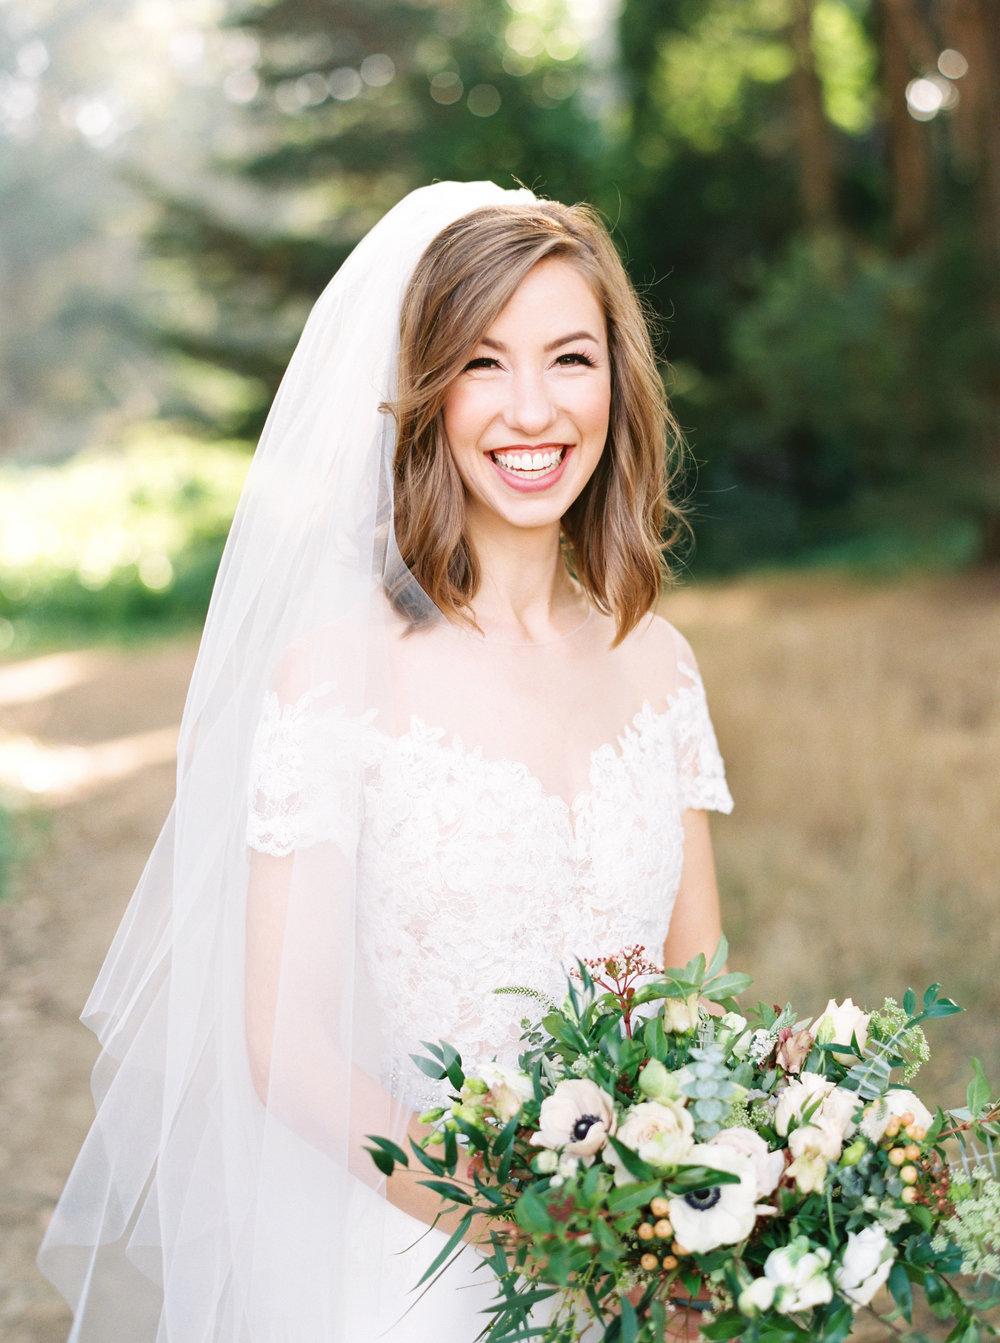 Log-cabin-wedding-in-presidio-san-francisco-california-desintation-wedding-photography-44.jpg